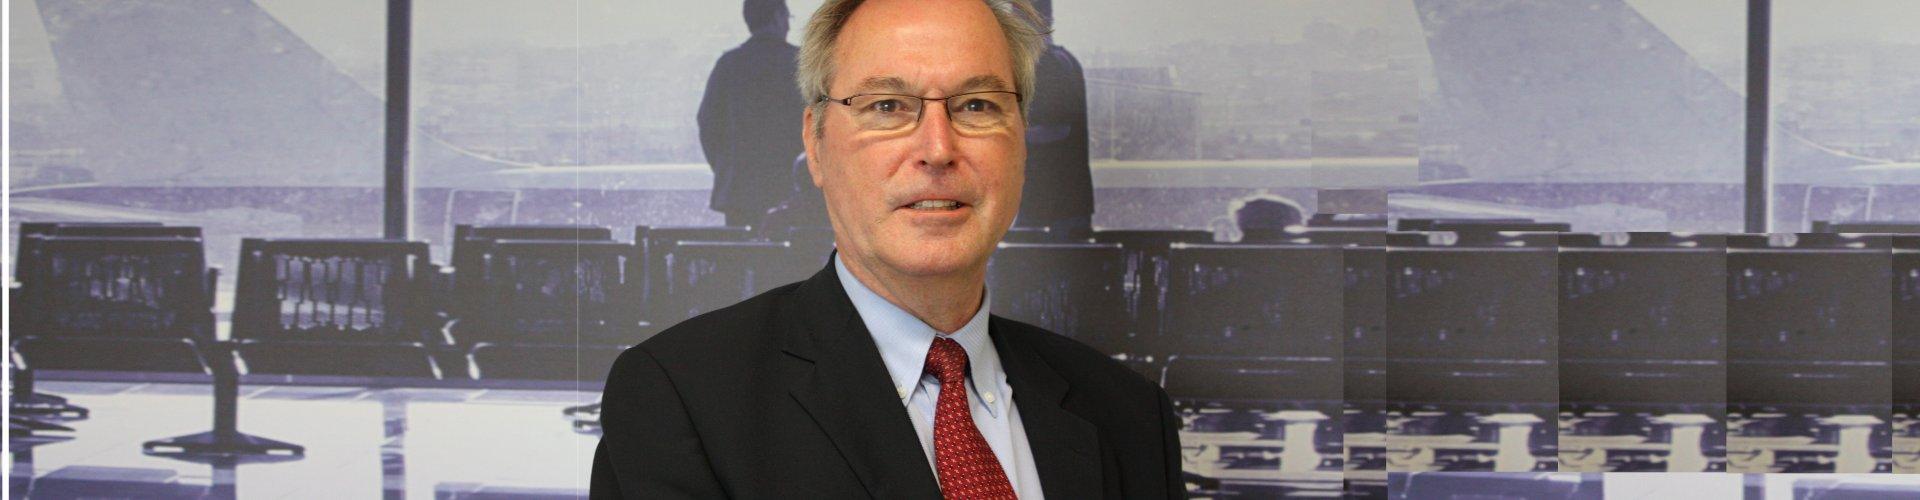 Fred Hirdes Excel specialist